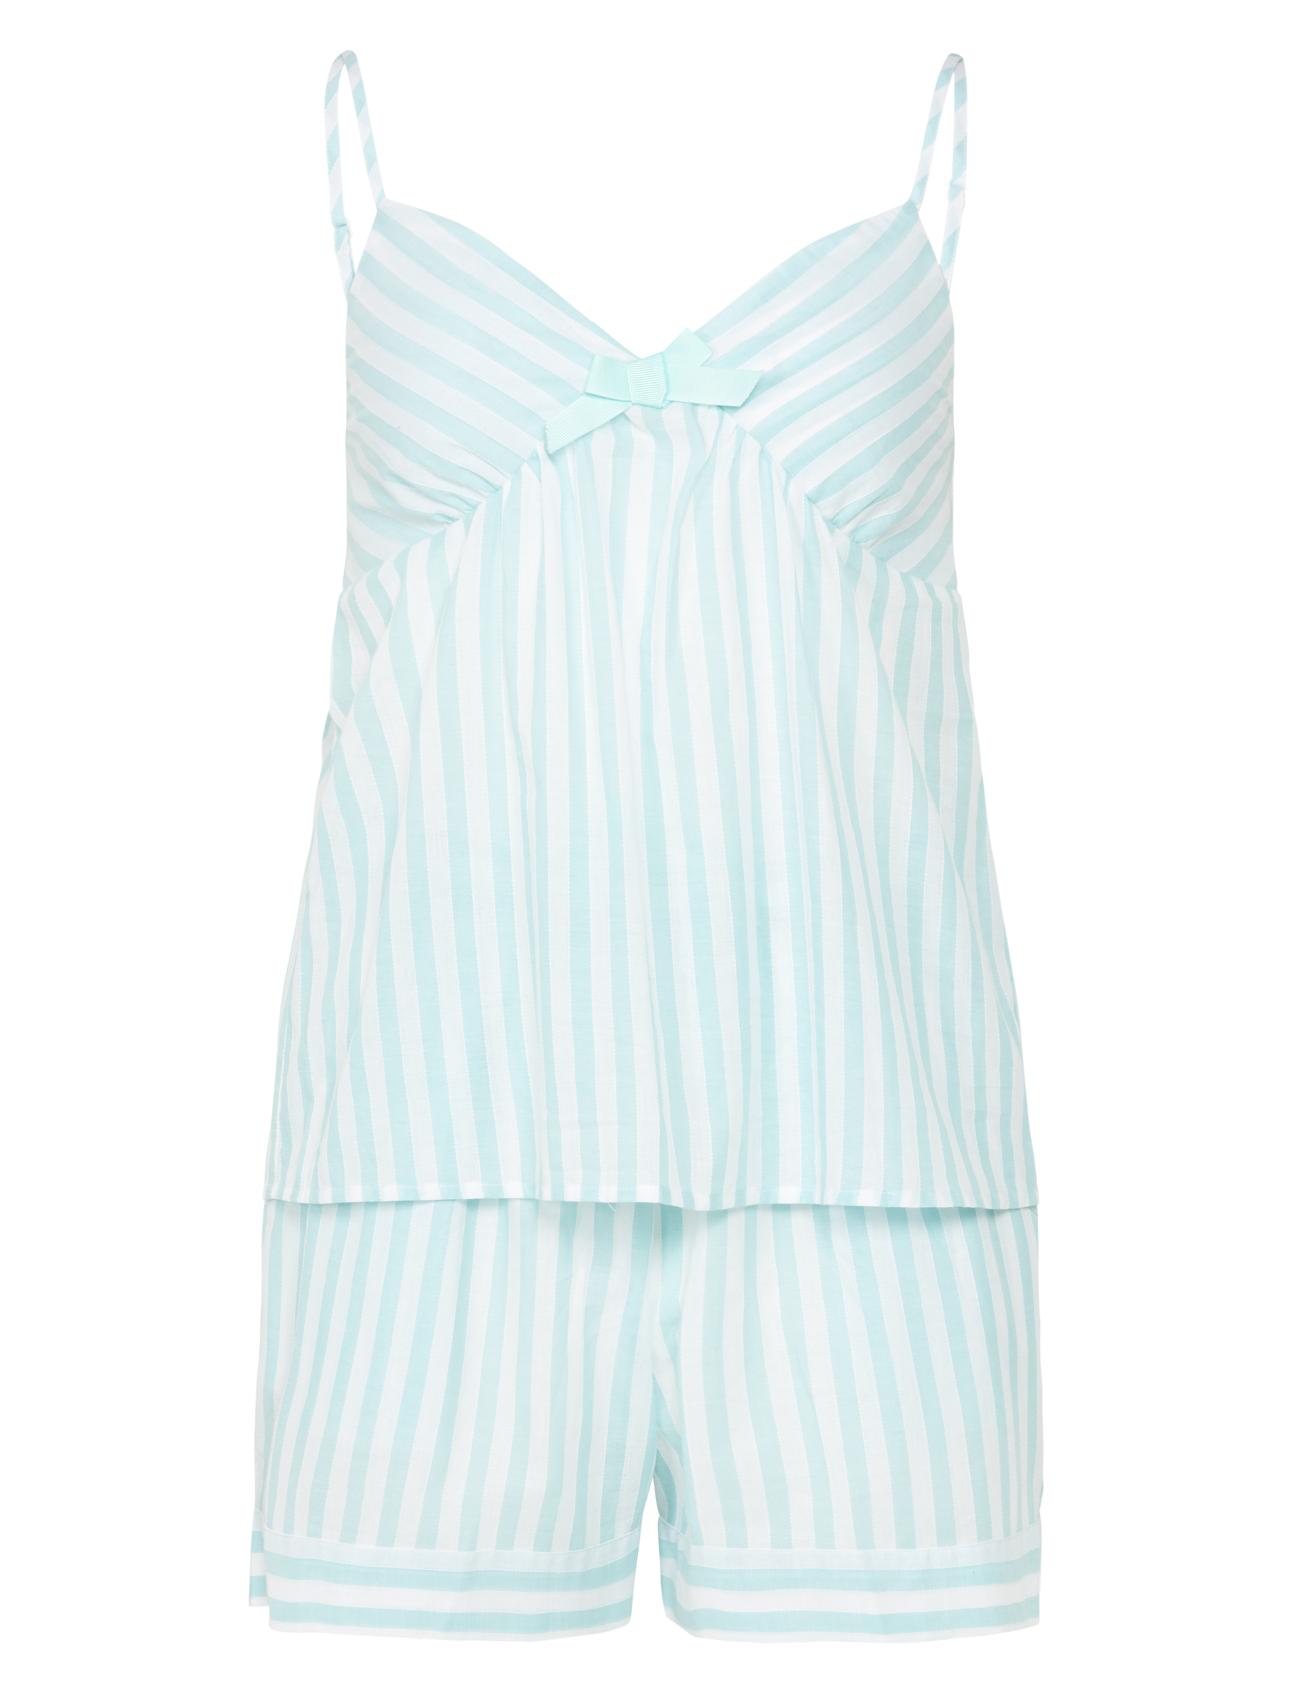 Womens Striped PJs Set Slenderella 100% Cotton Lightweight Cami ...